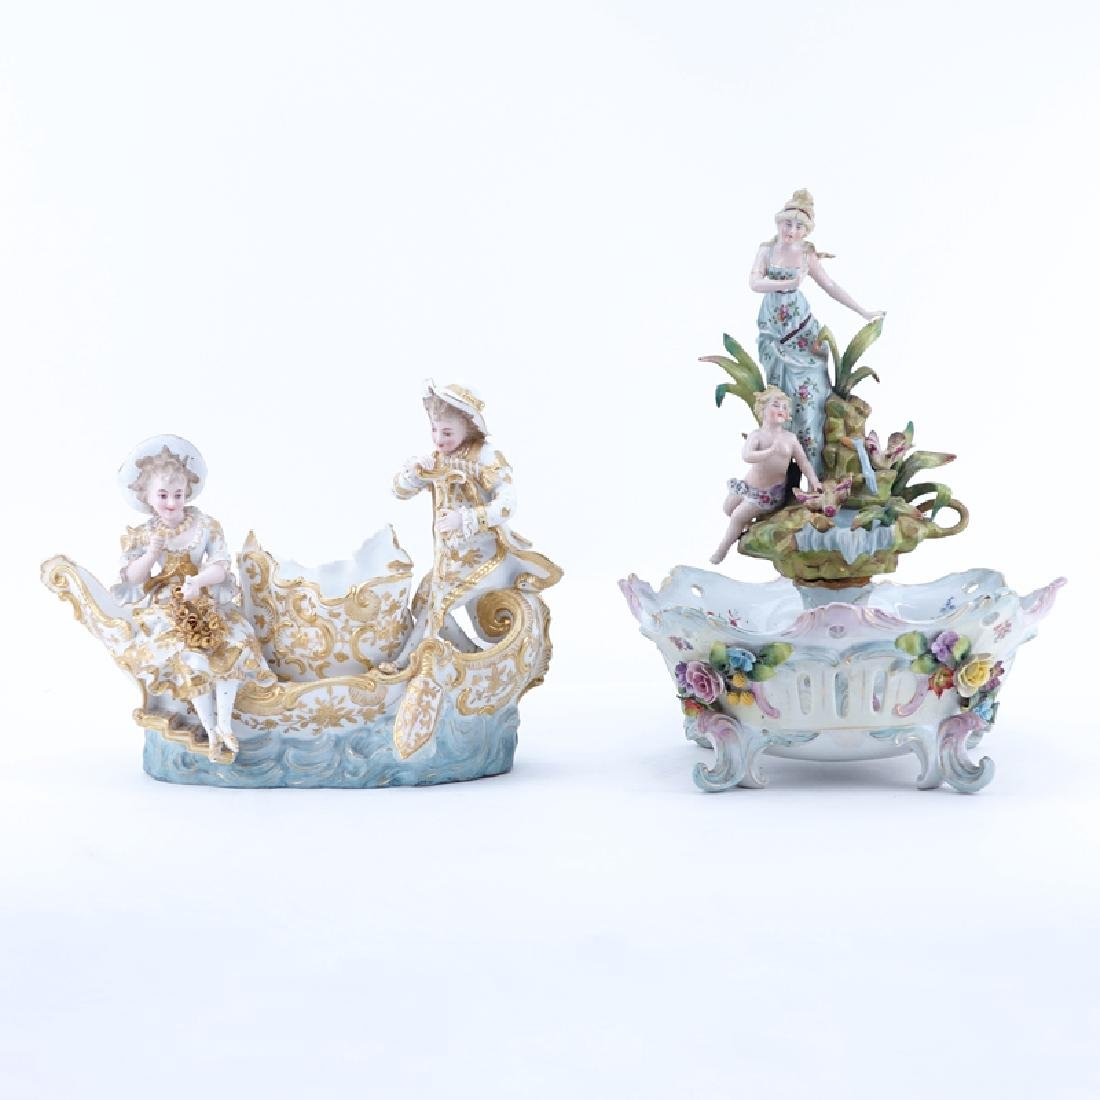 Two (2) German Vintage Decorative Porcelain Groups.